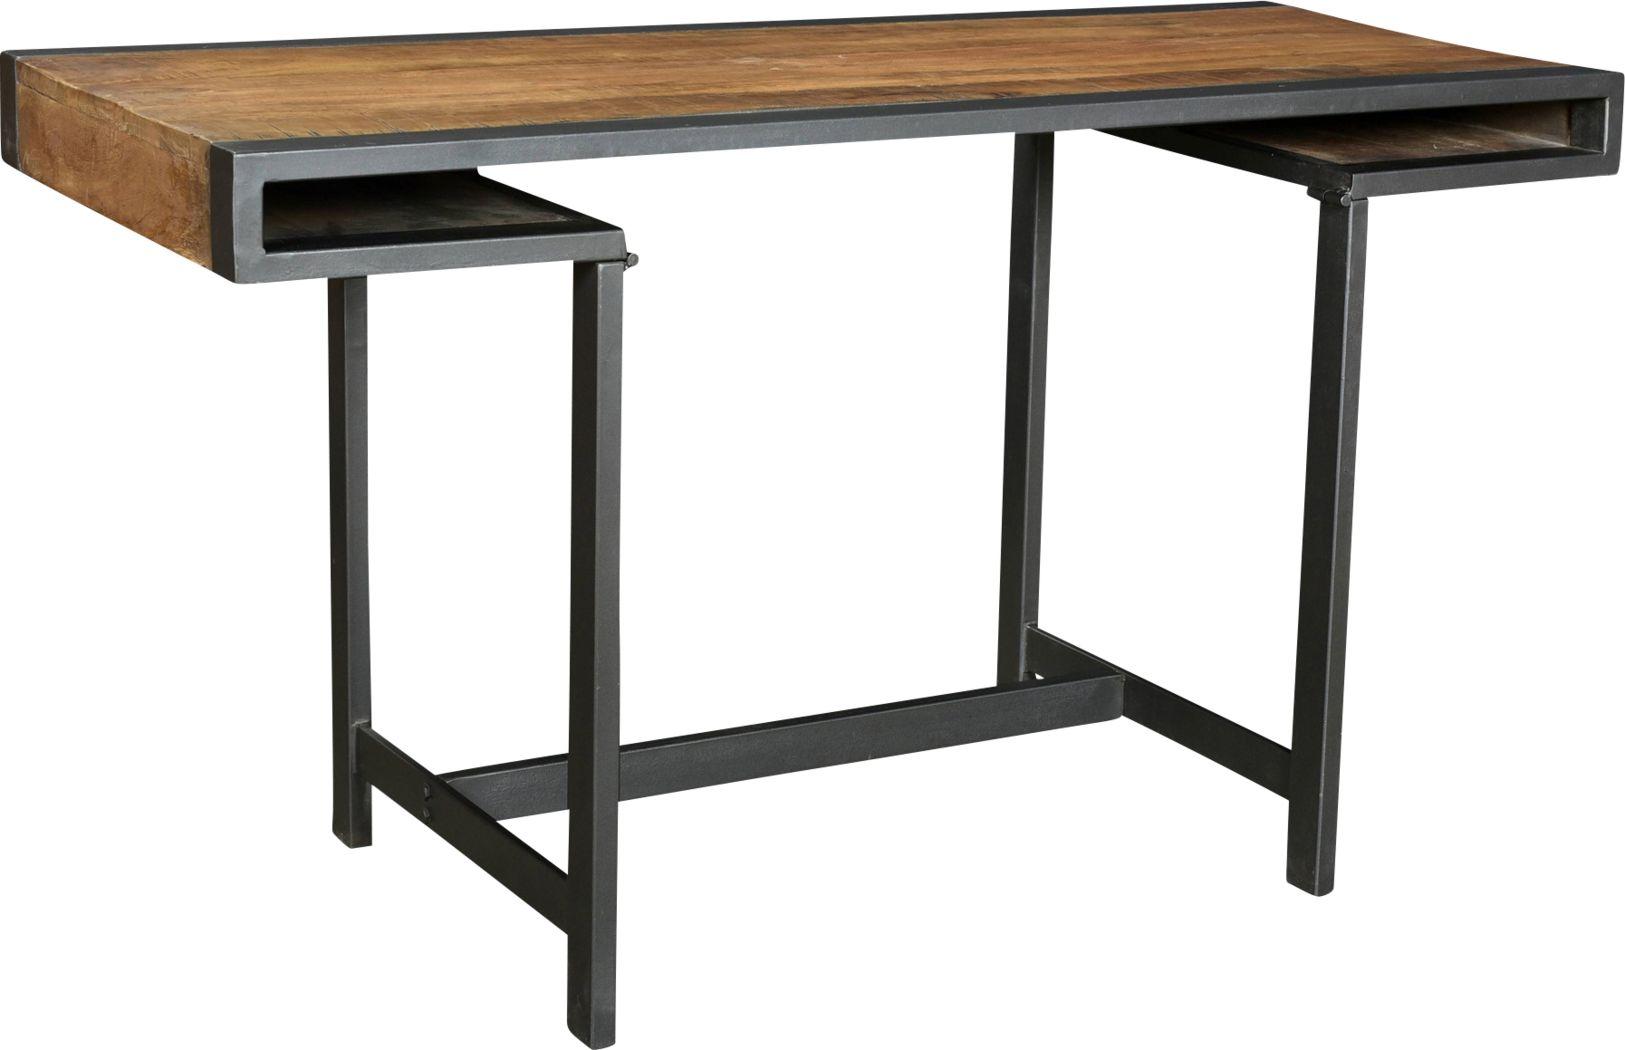 Adriatic Brown Desk